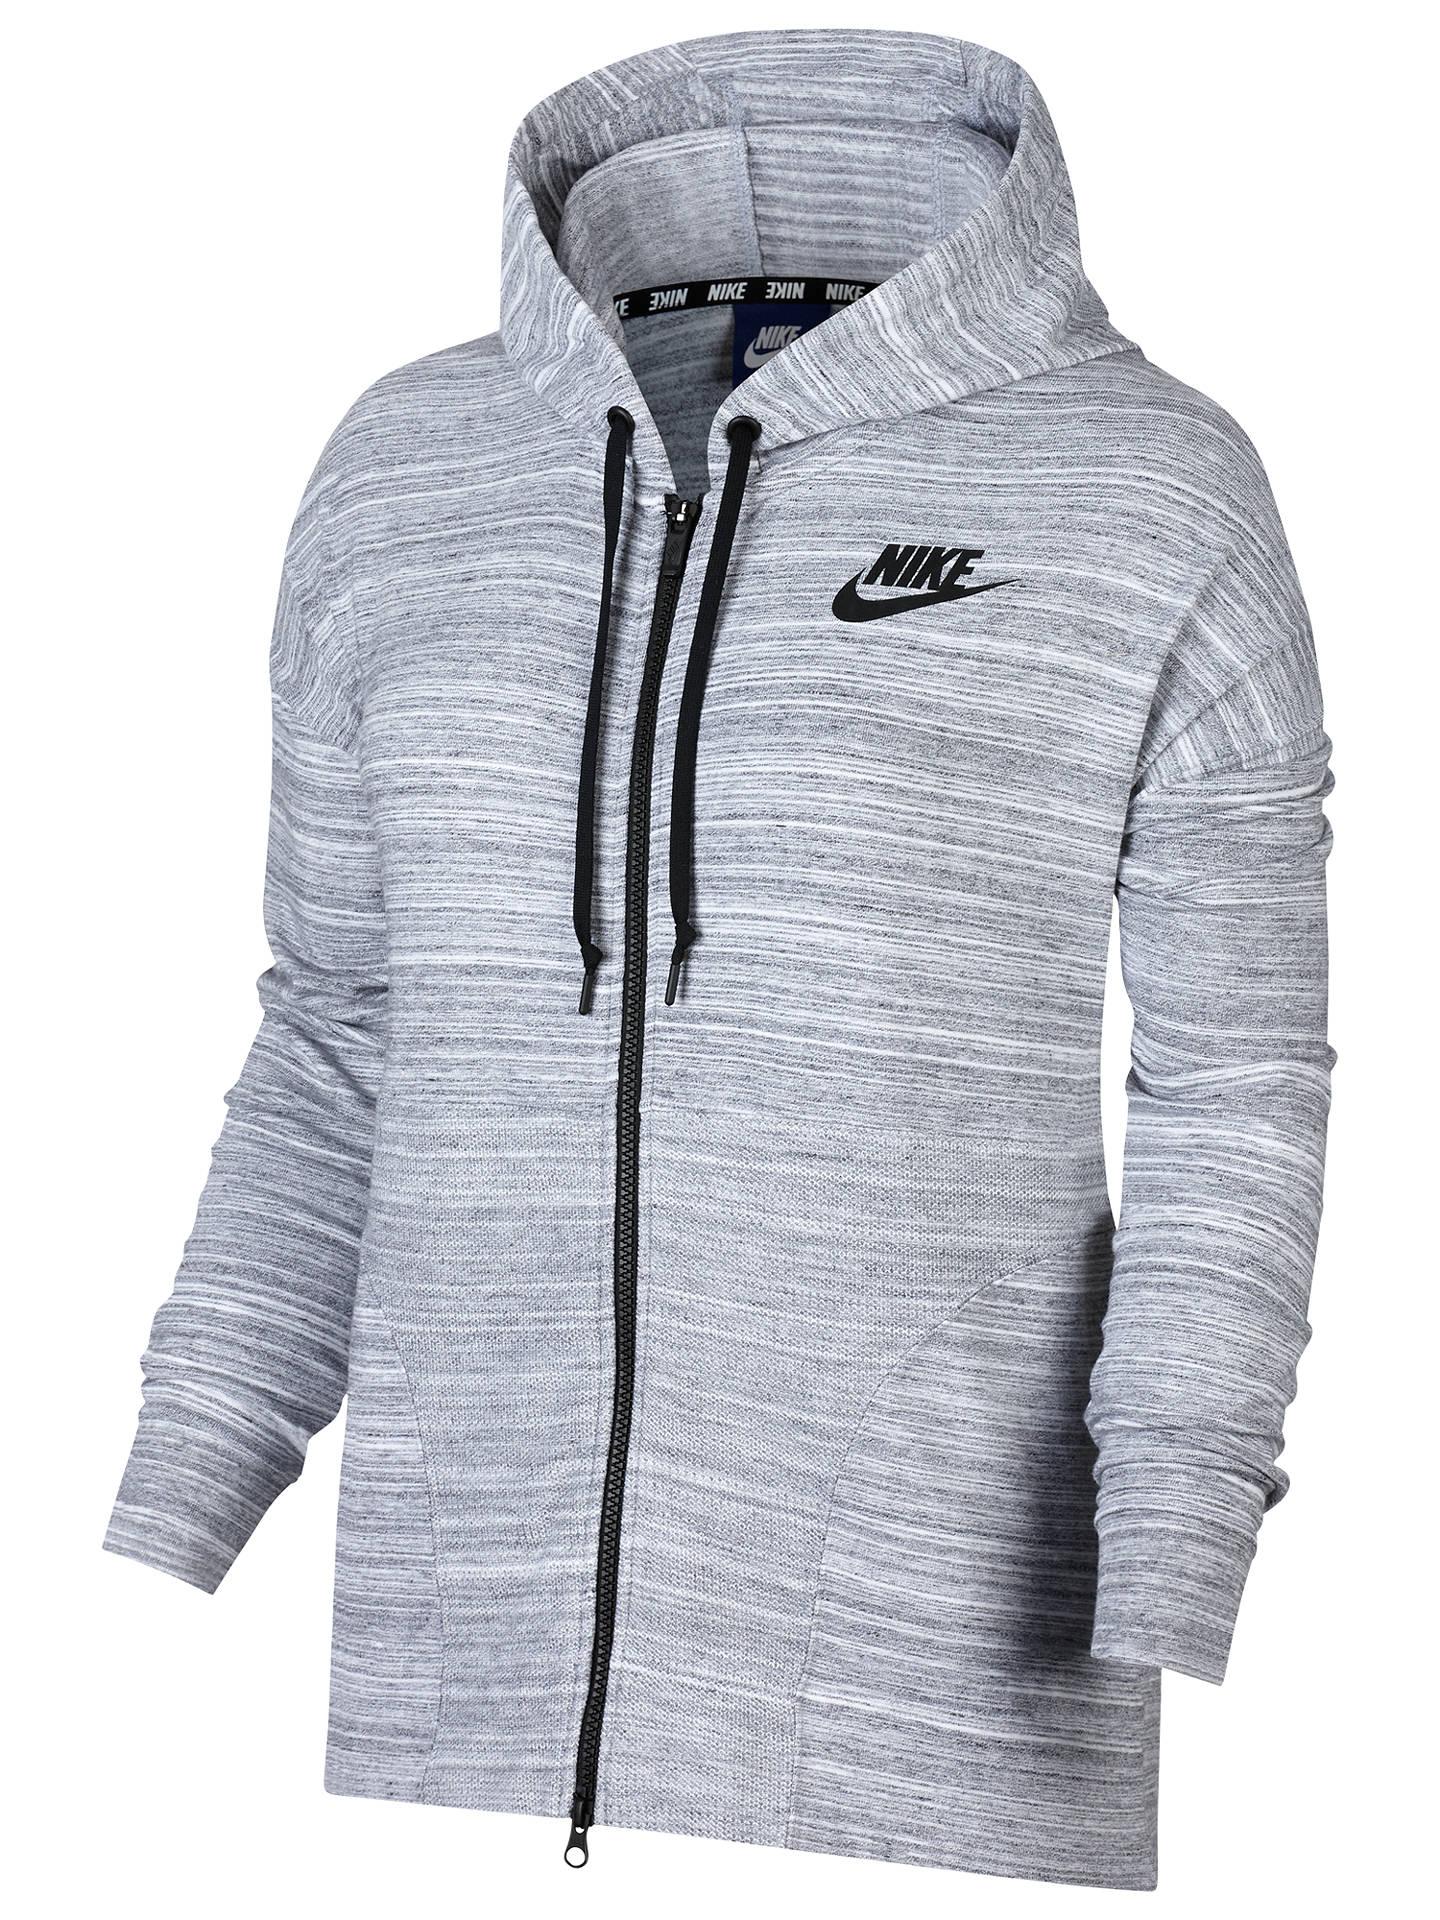 a9bc6625 Buy Nike Sportswear Advance 15 Jacket, White/Black, XS Online at johnlewis.